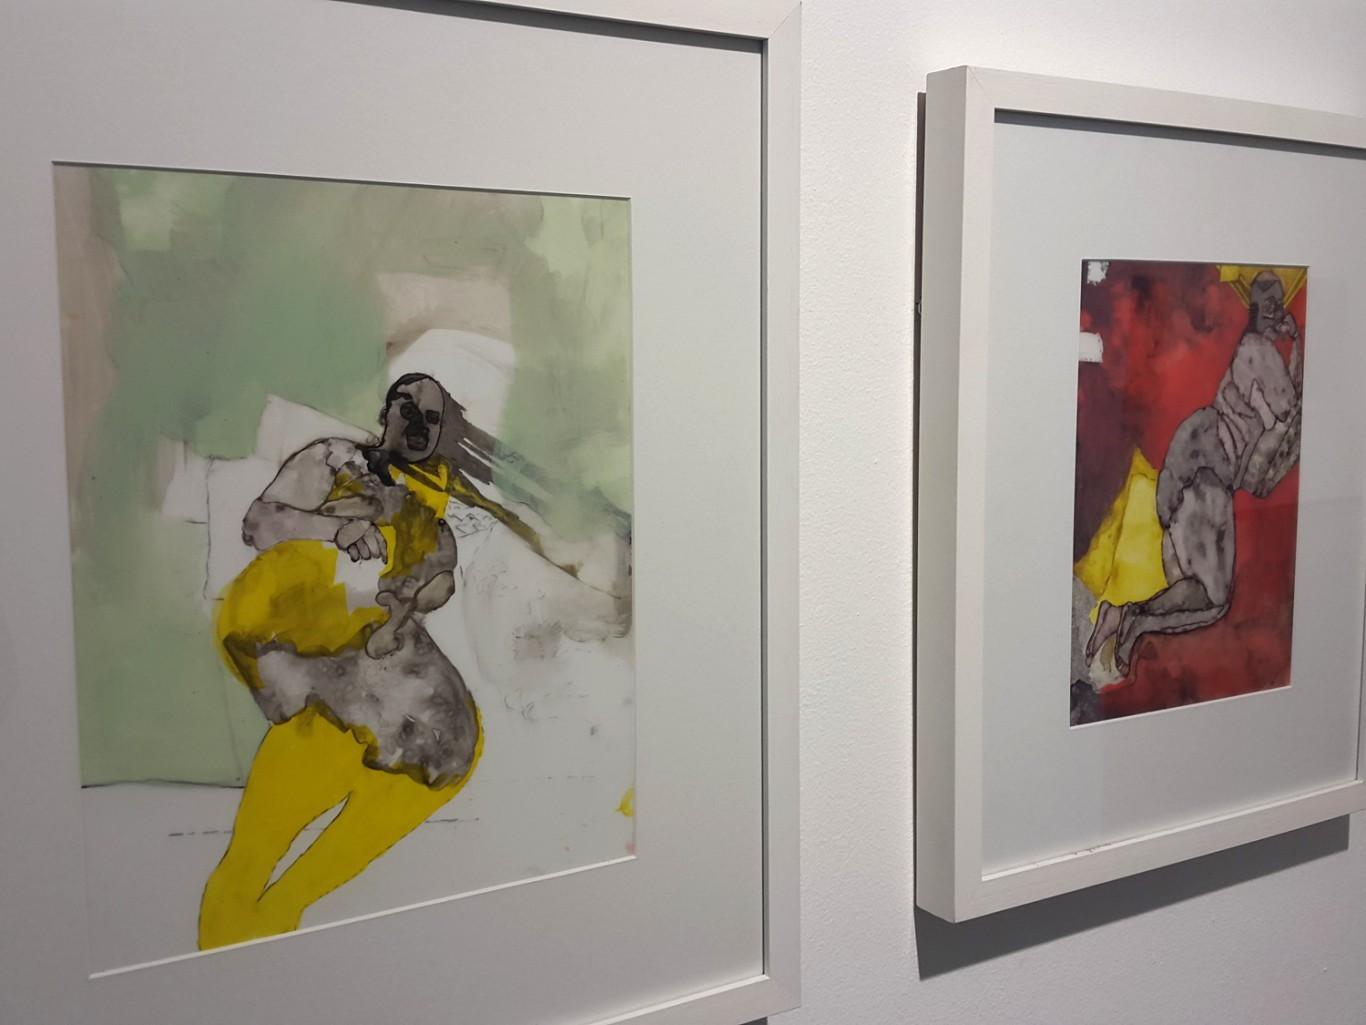 Florine Demosthene at Gallery MOMO